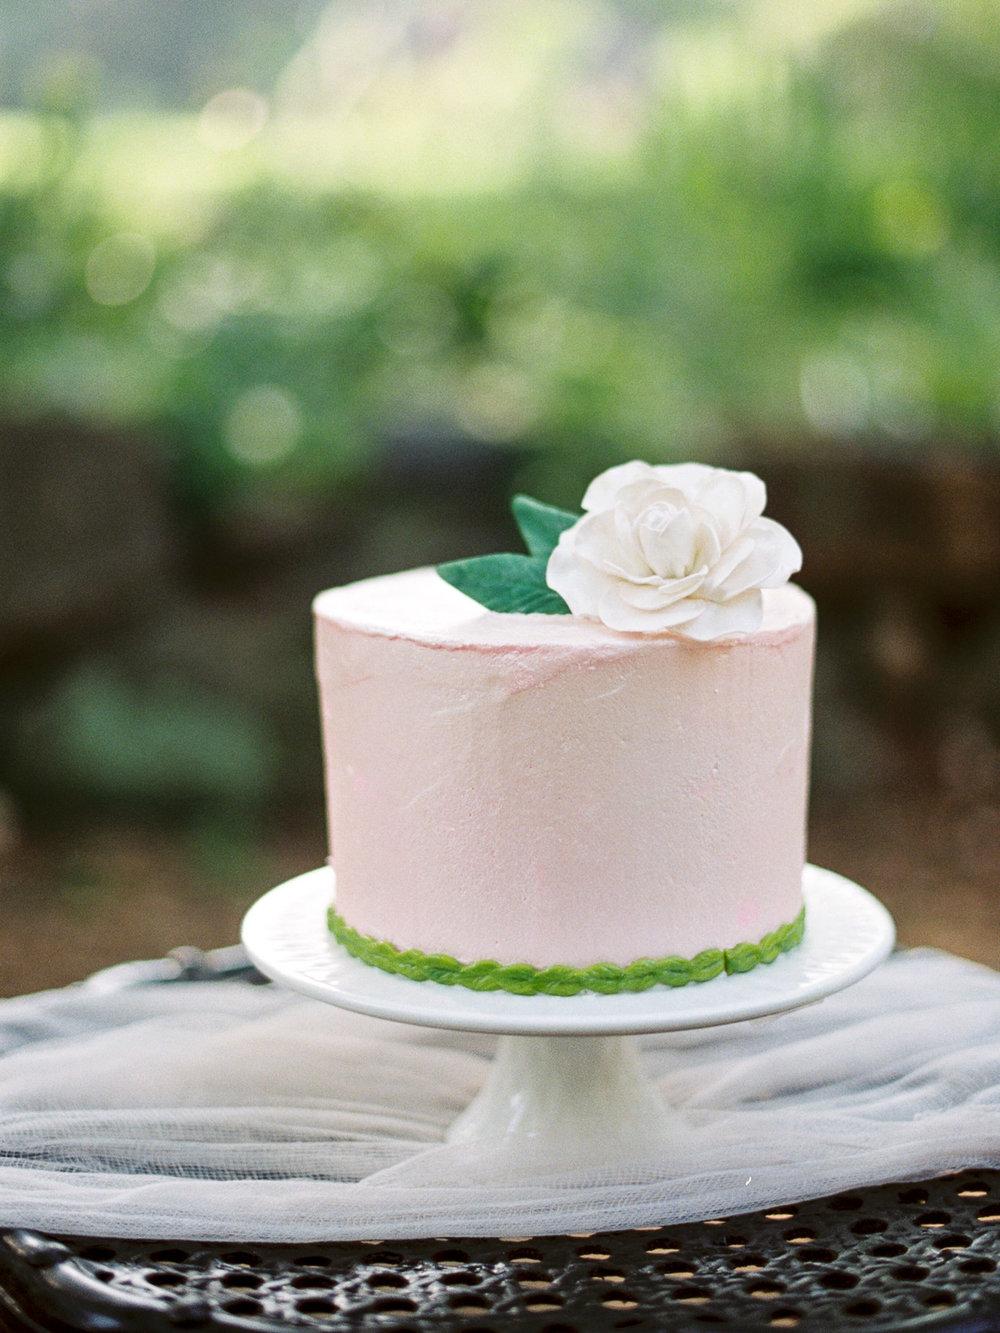 christinadavisphotography-romanticwedding-gardenweddinginspiration55.jpg